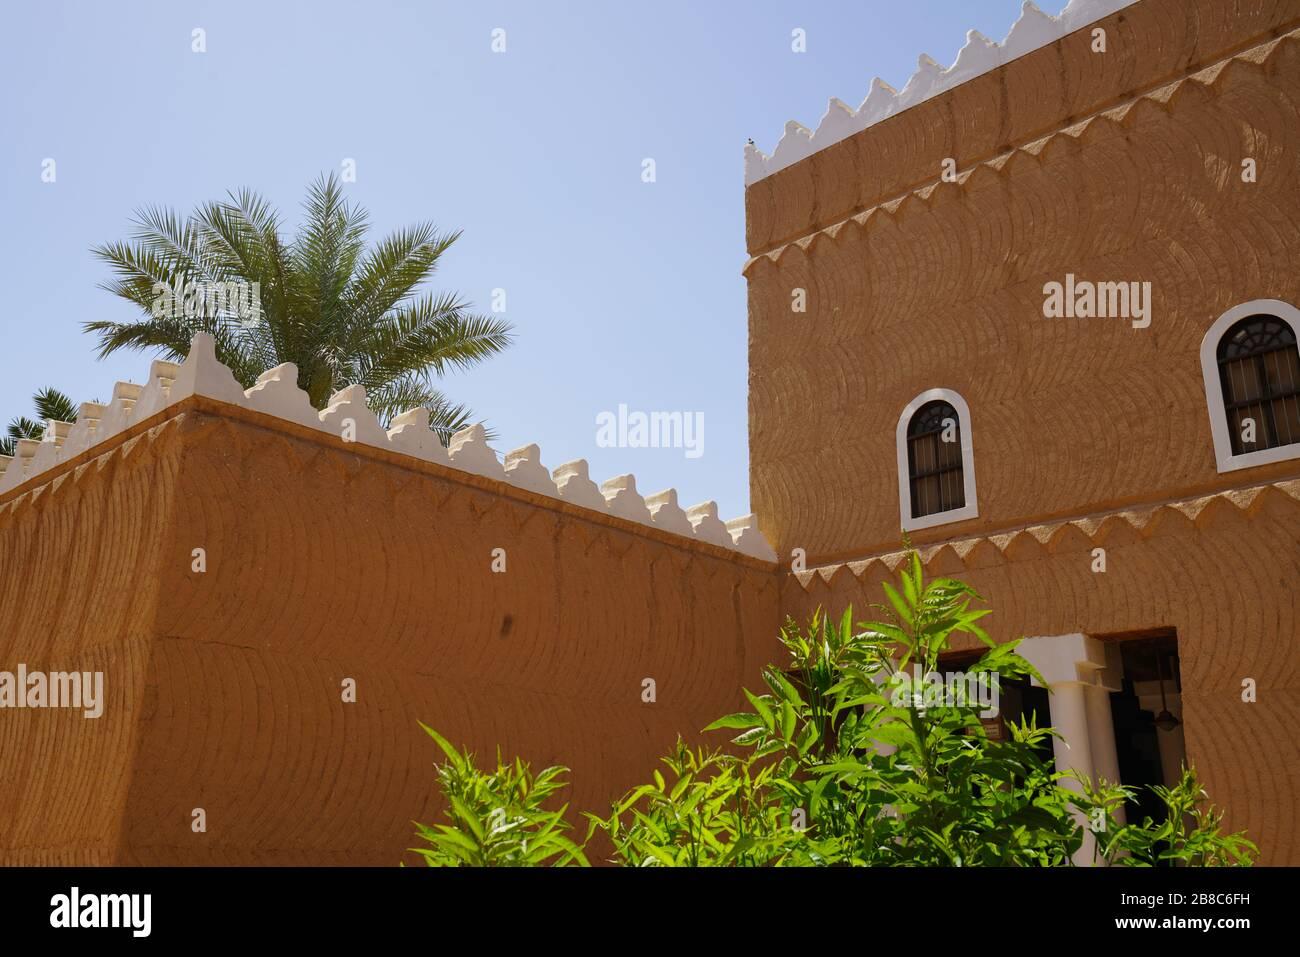 Riyadh - Riyadh / Saudi Arabia - March 07  2020: View of The Murabba Palace Qasr al Murabba is Historic Building Stock Photo